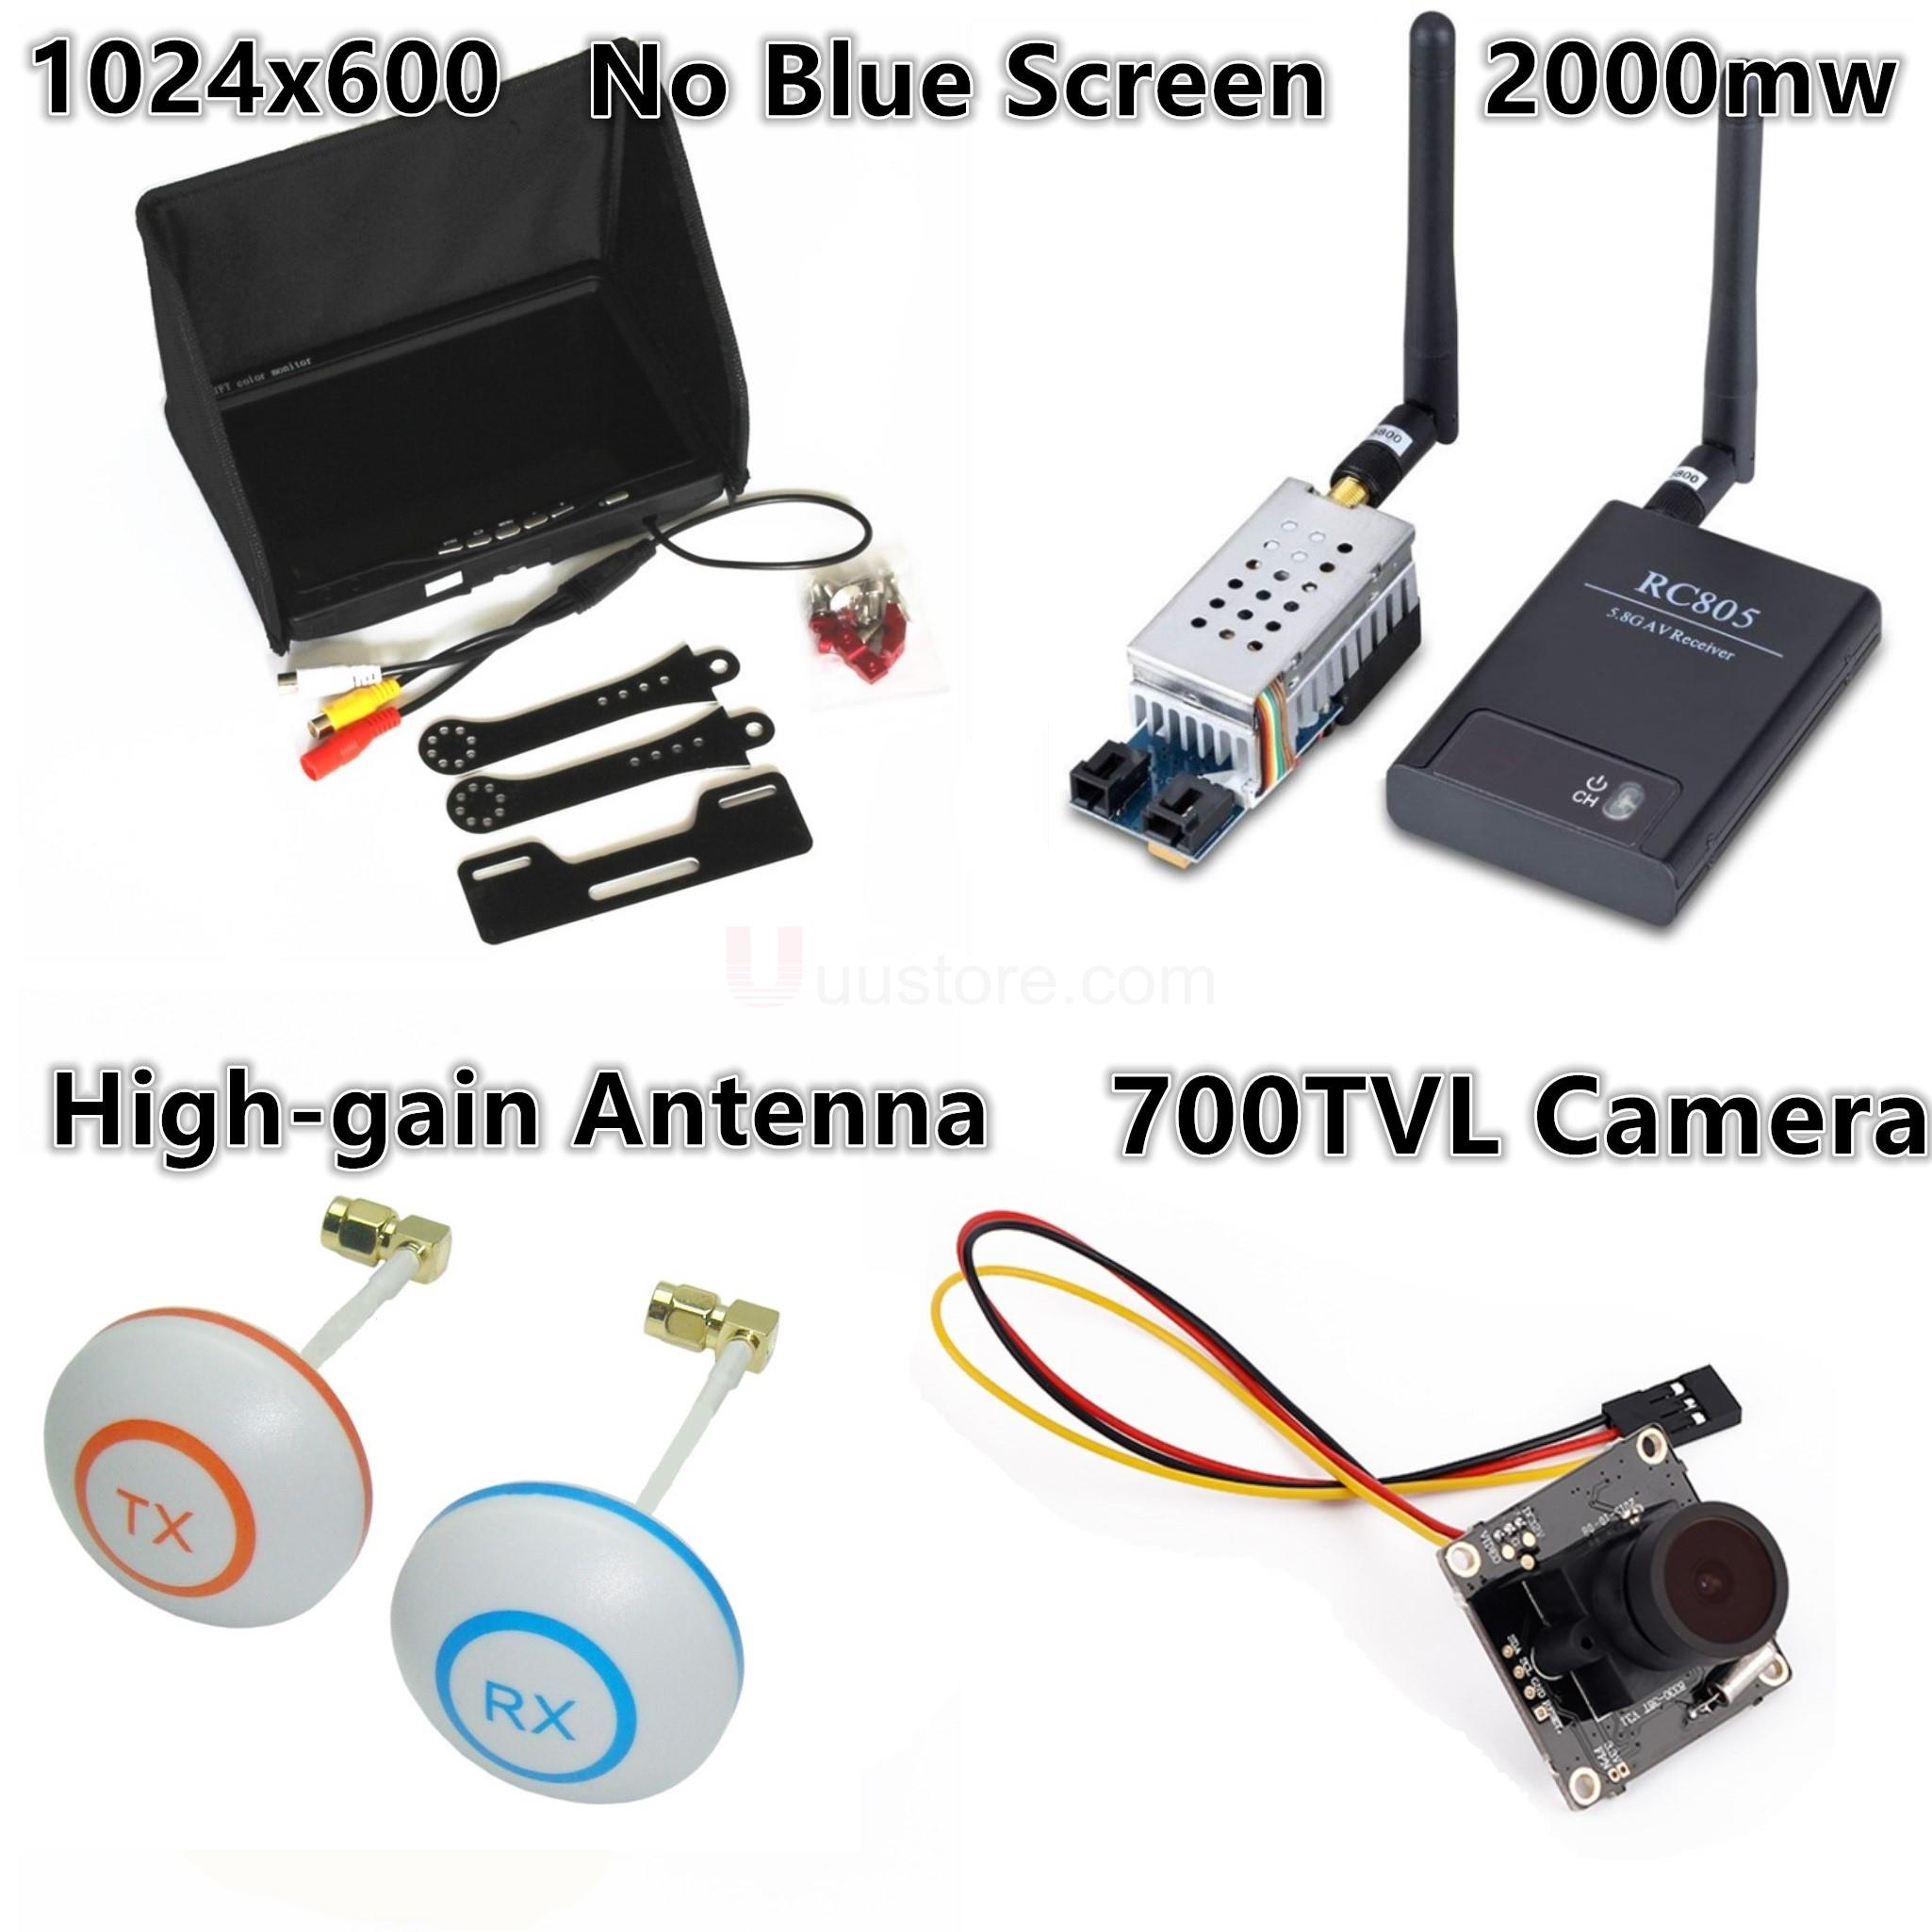 FPV boscam sistema Combo 5.8 GHz 5.8G 2000 mW transmisor ts582000 TX rc805 receptor RX 1024x600 Monitores 700tvl cámara para drone